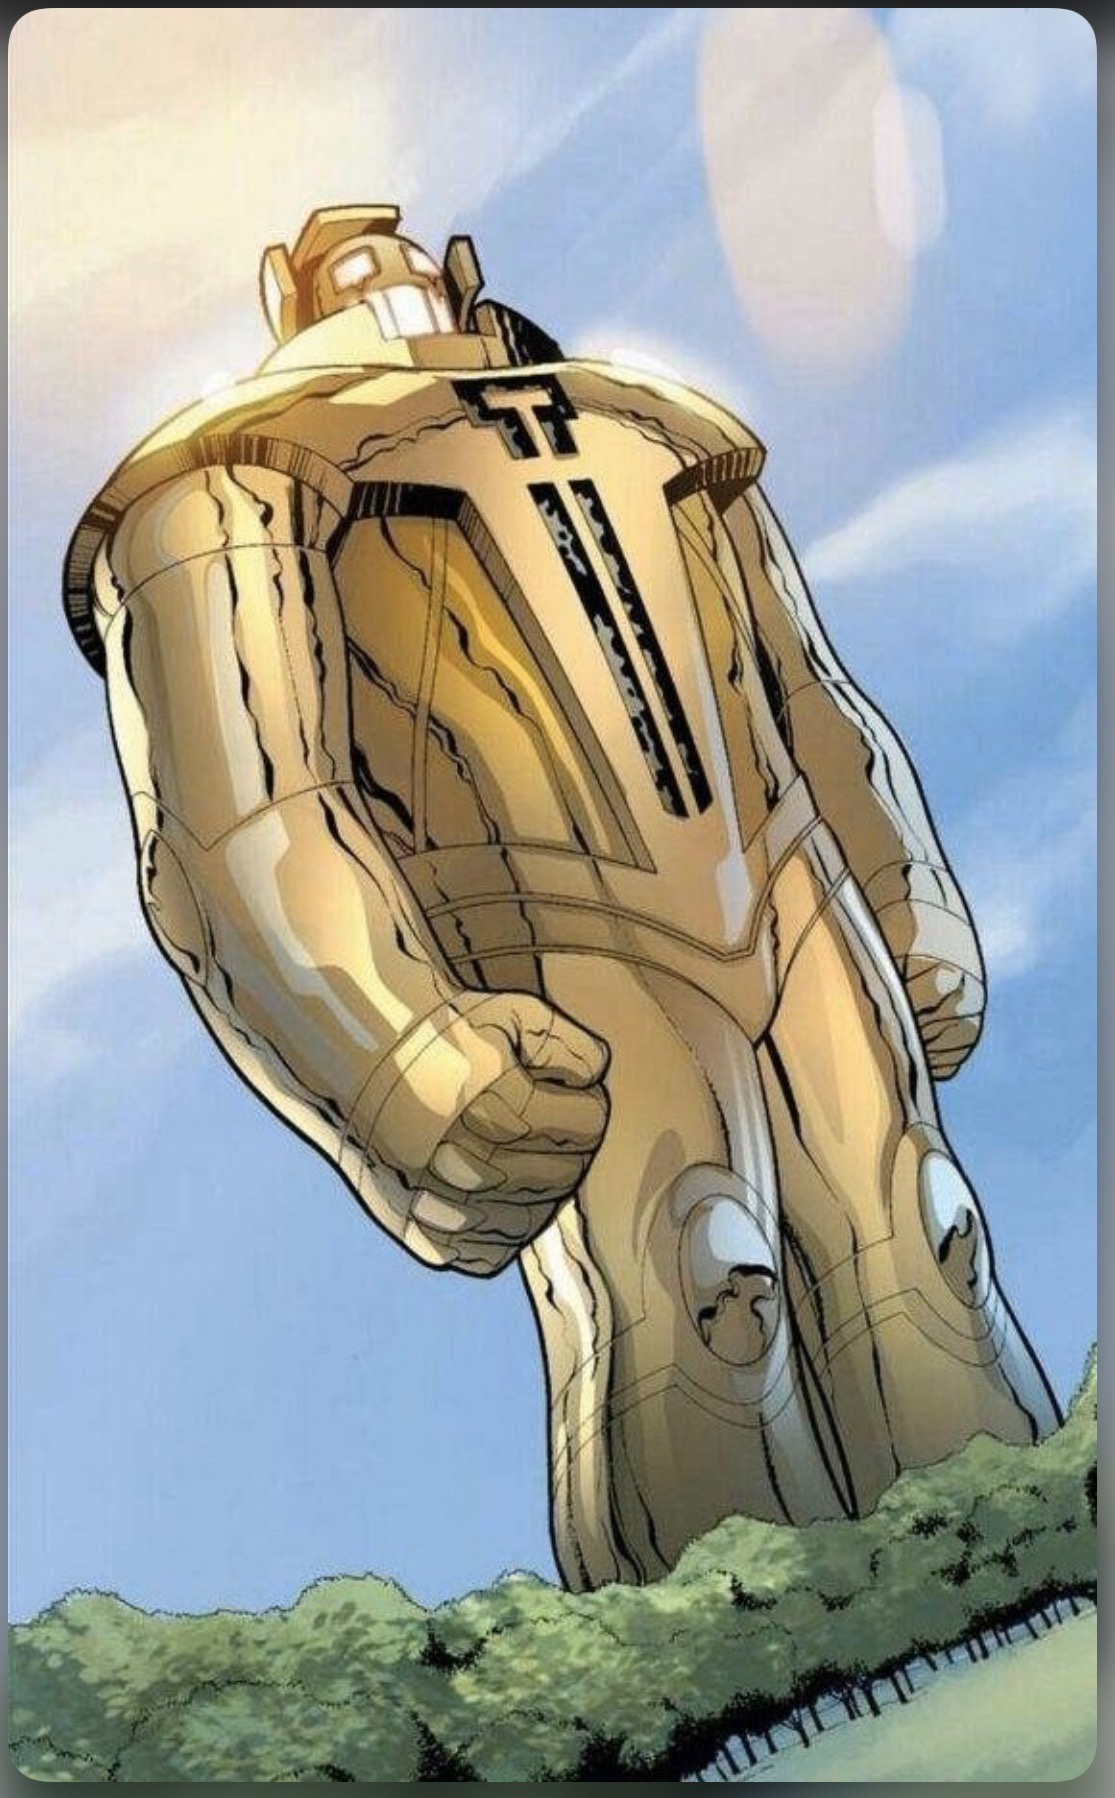 Who is Tiamut in Marvel Comics? - Quora